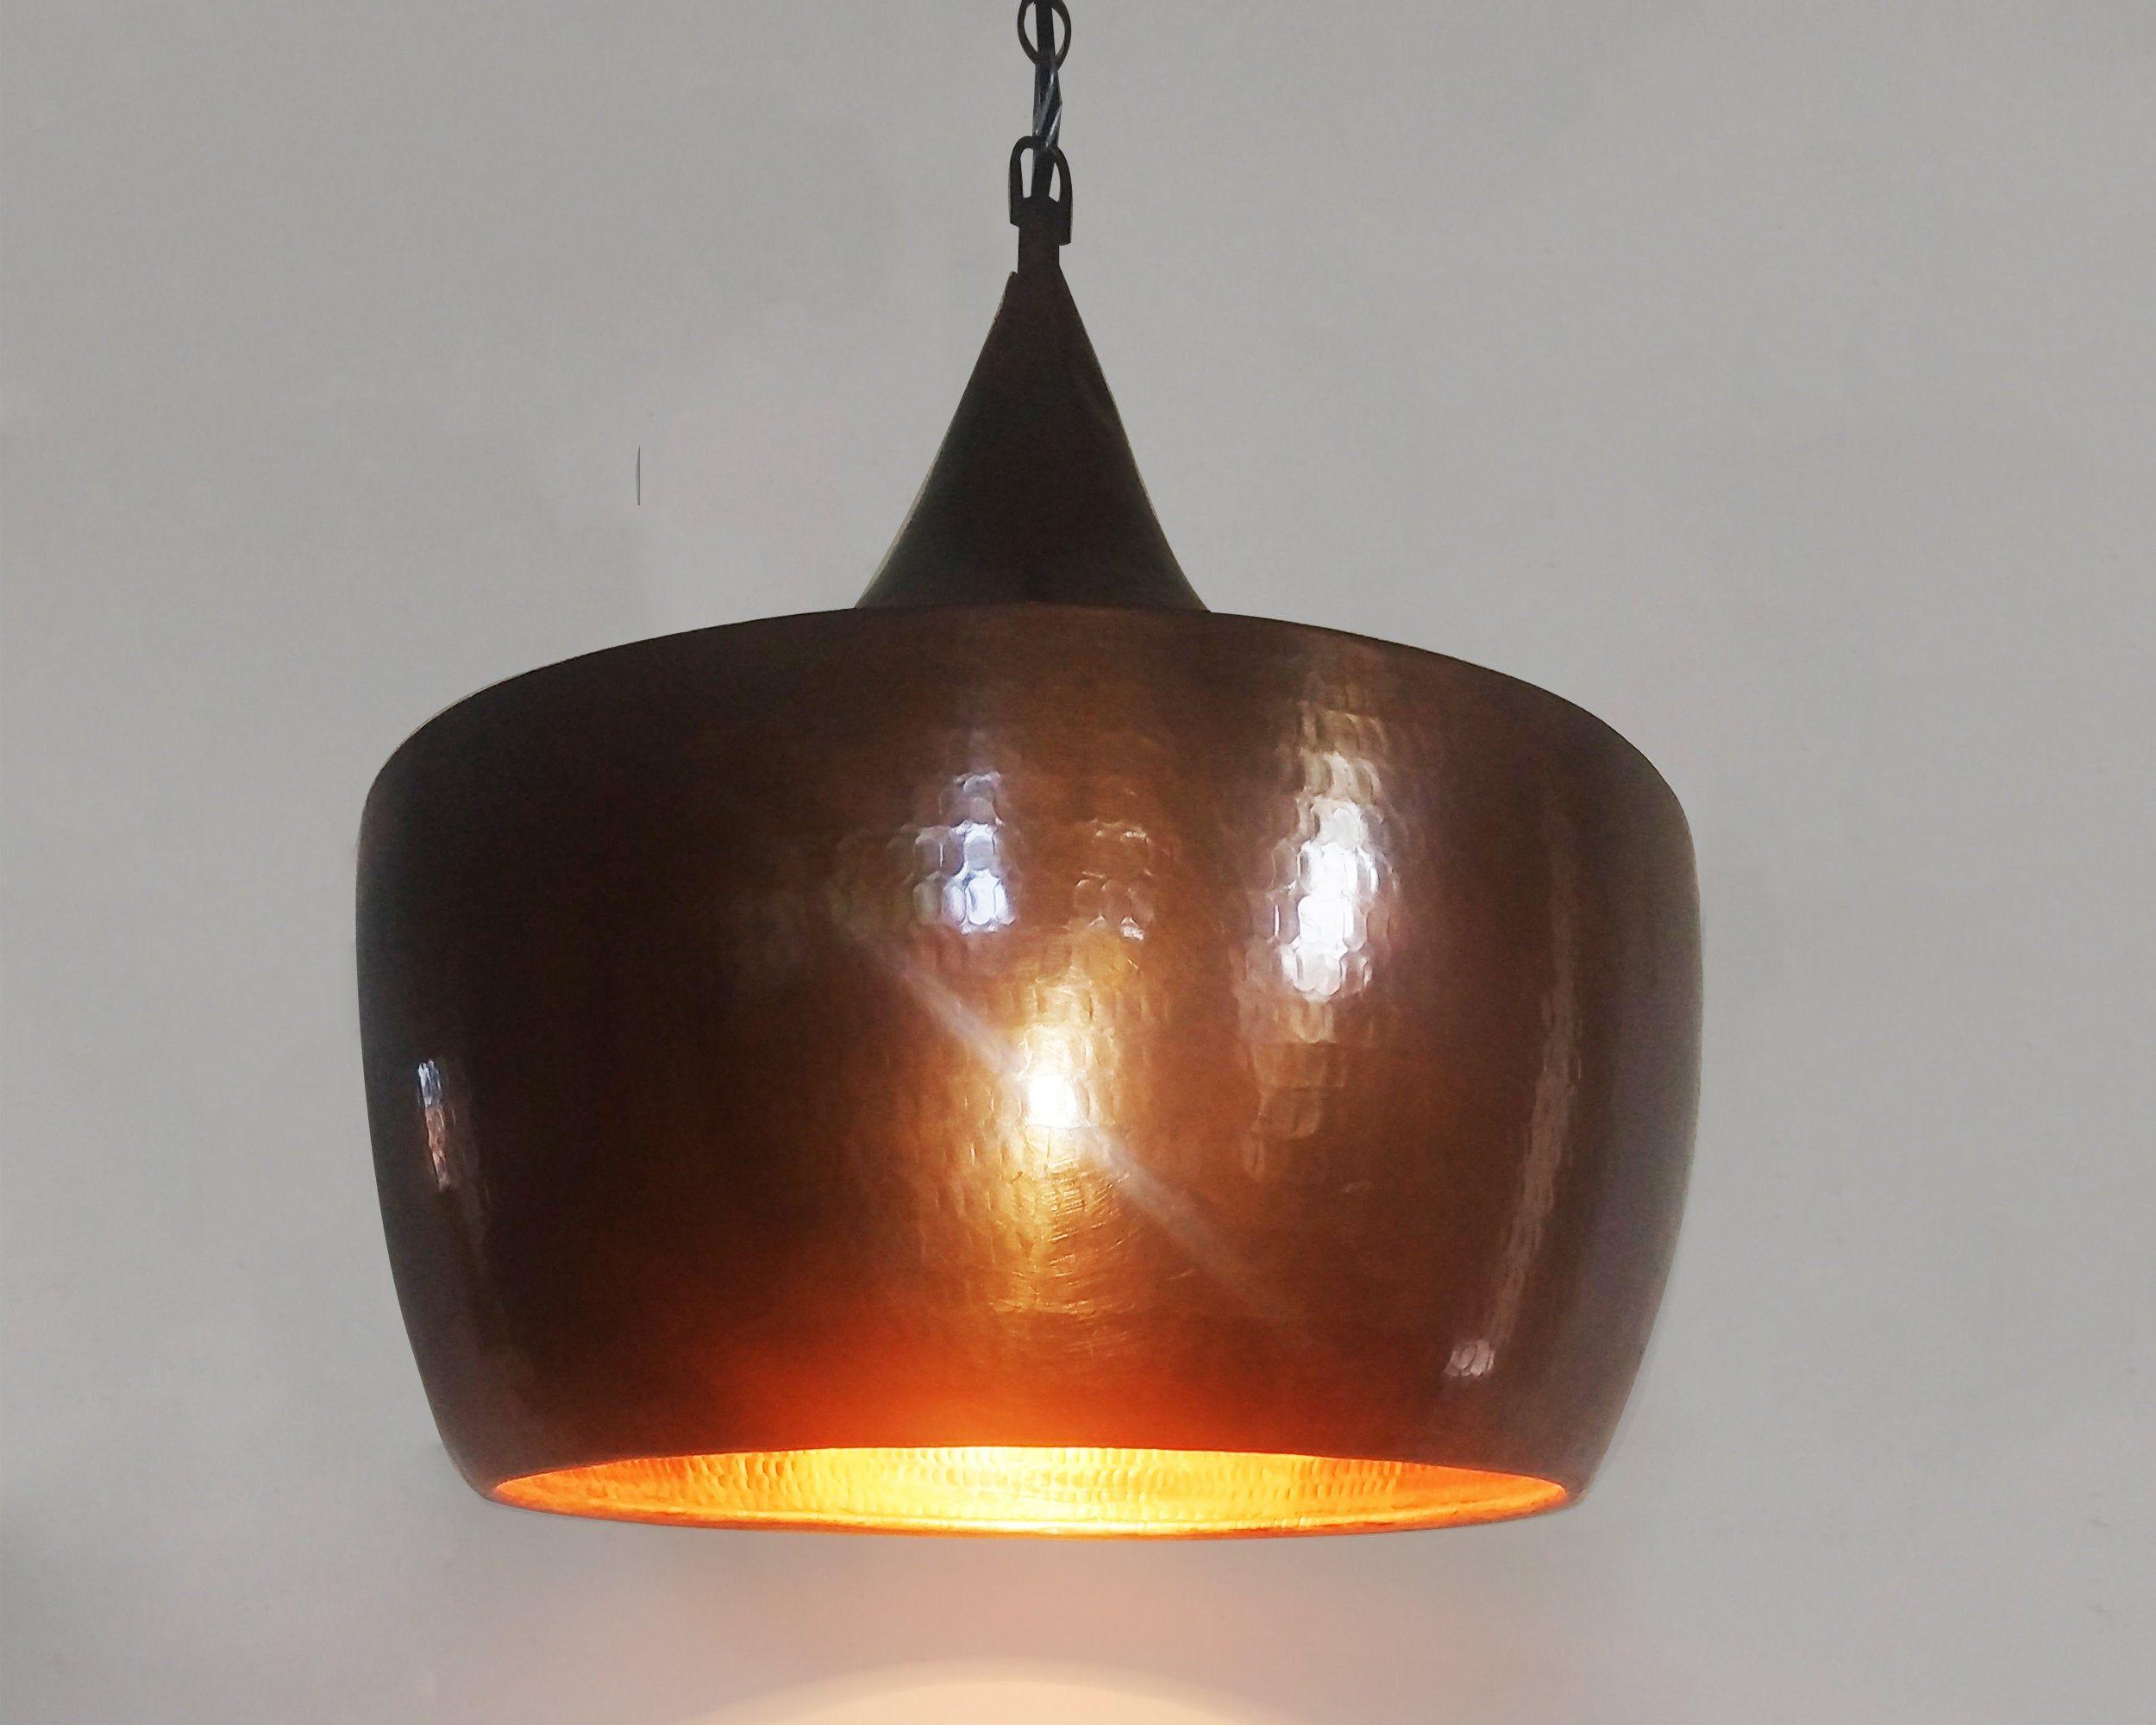 Scandinavian Brown Copper Pendant Light Hammered Copper Light Copper Industrial Lamp Copper Kitch Copper Lampshade Copper Light Fixture Copper Lighting